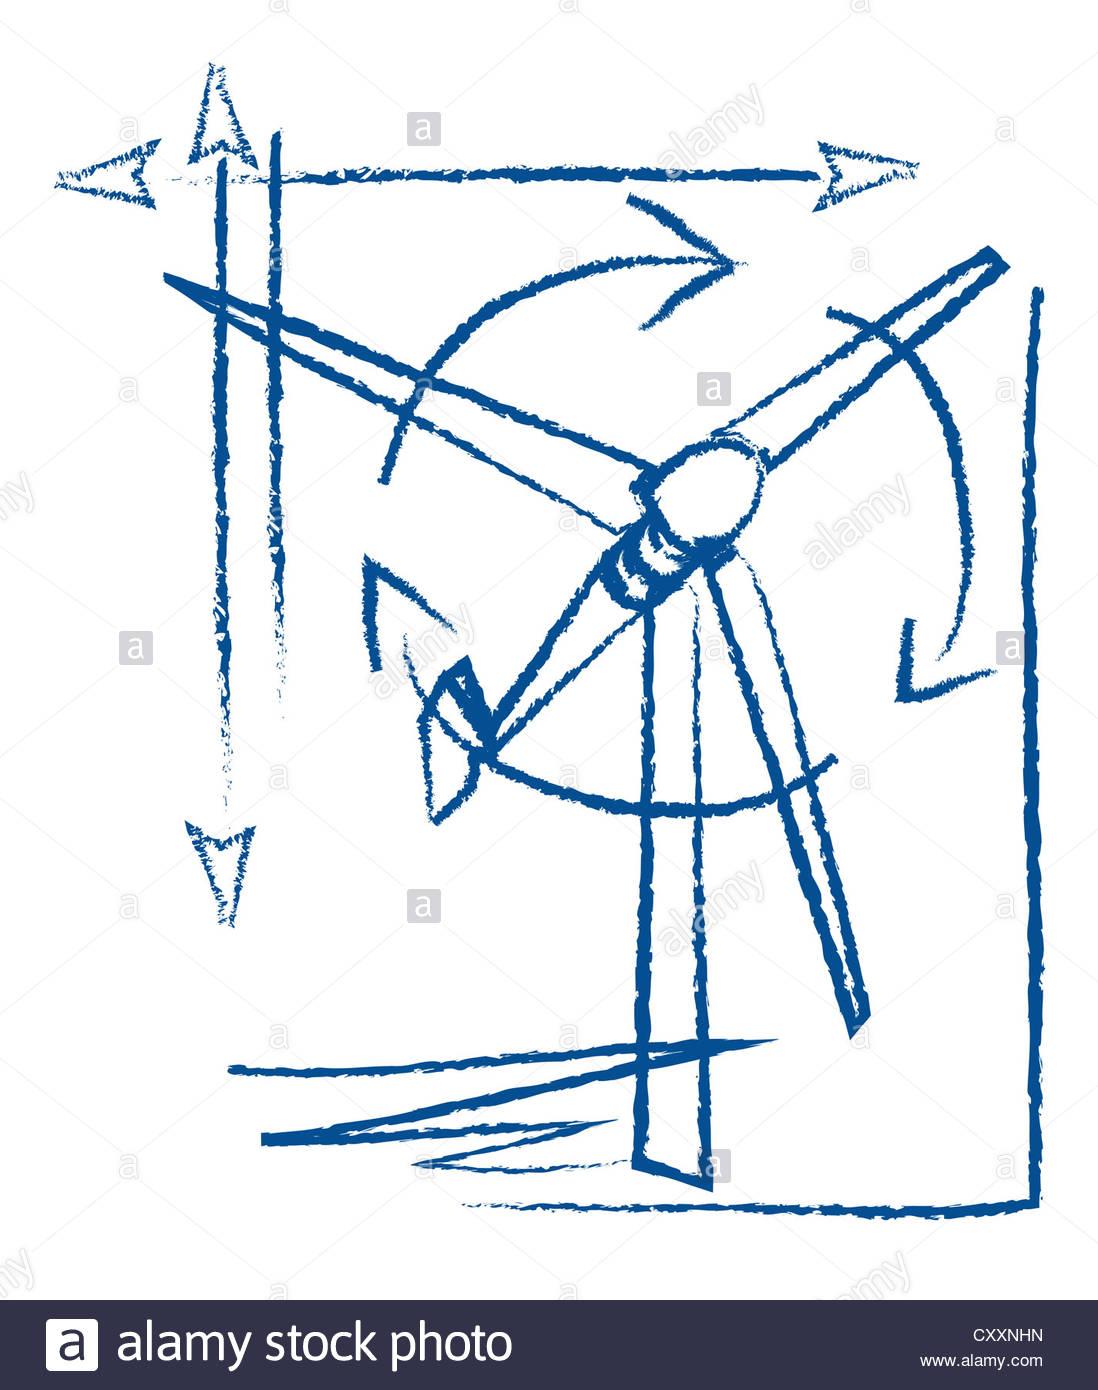 1098x1390 Wind Turbine, Technical Drawing, Illustration Stock Photo